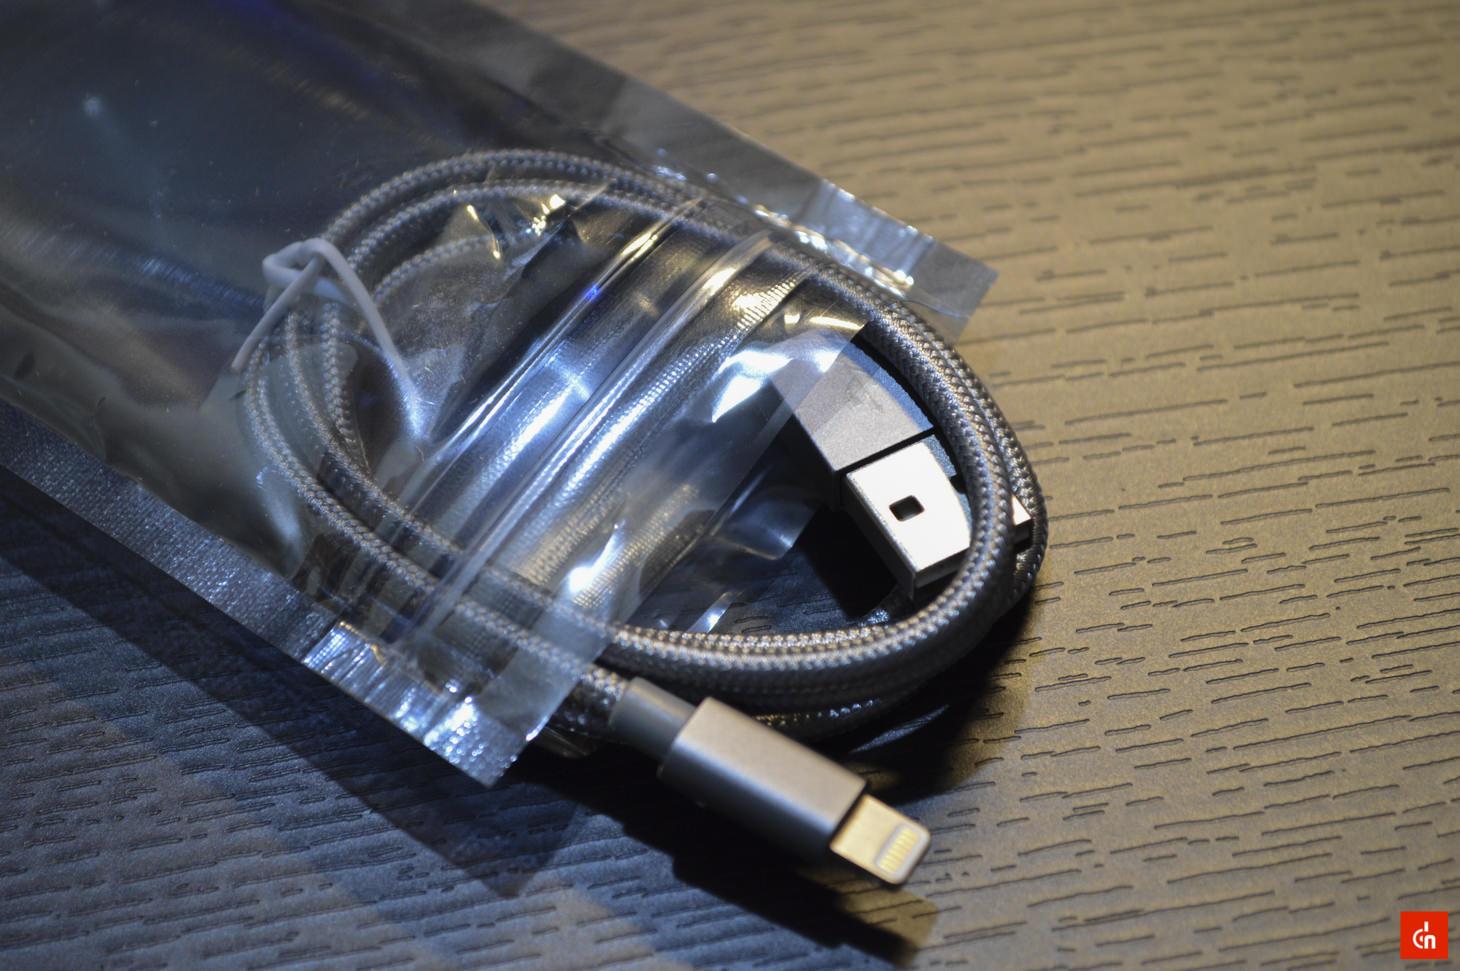 003_20160605_Lightning-cable-omaker